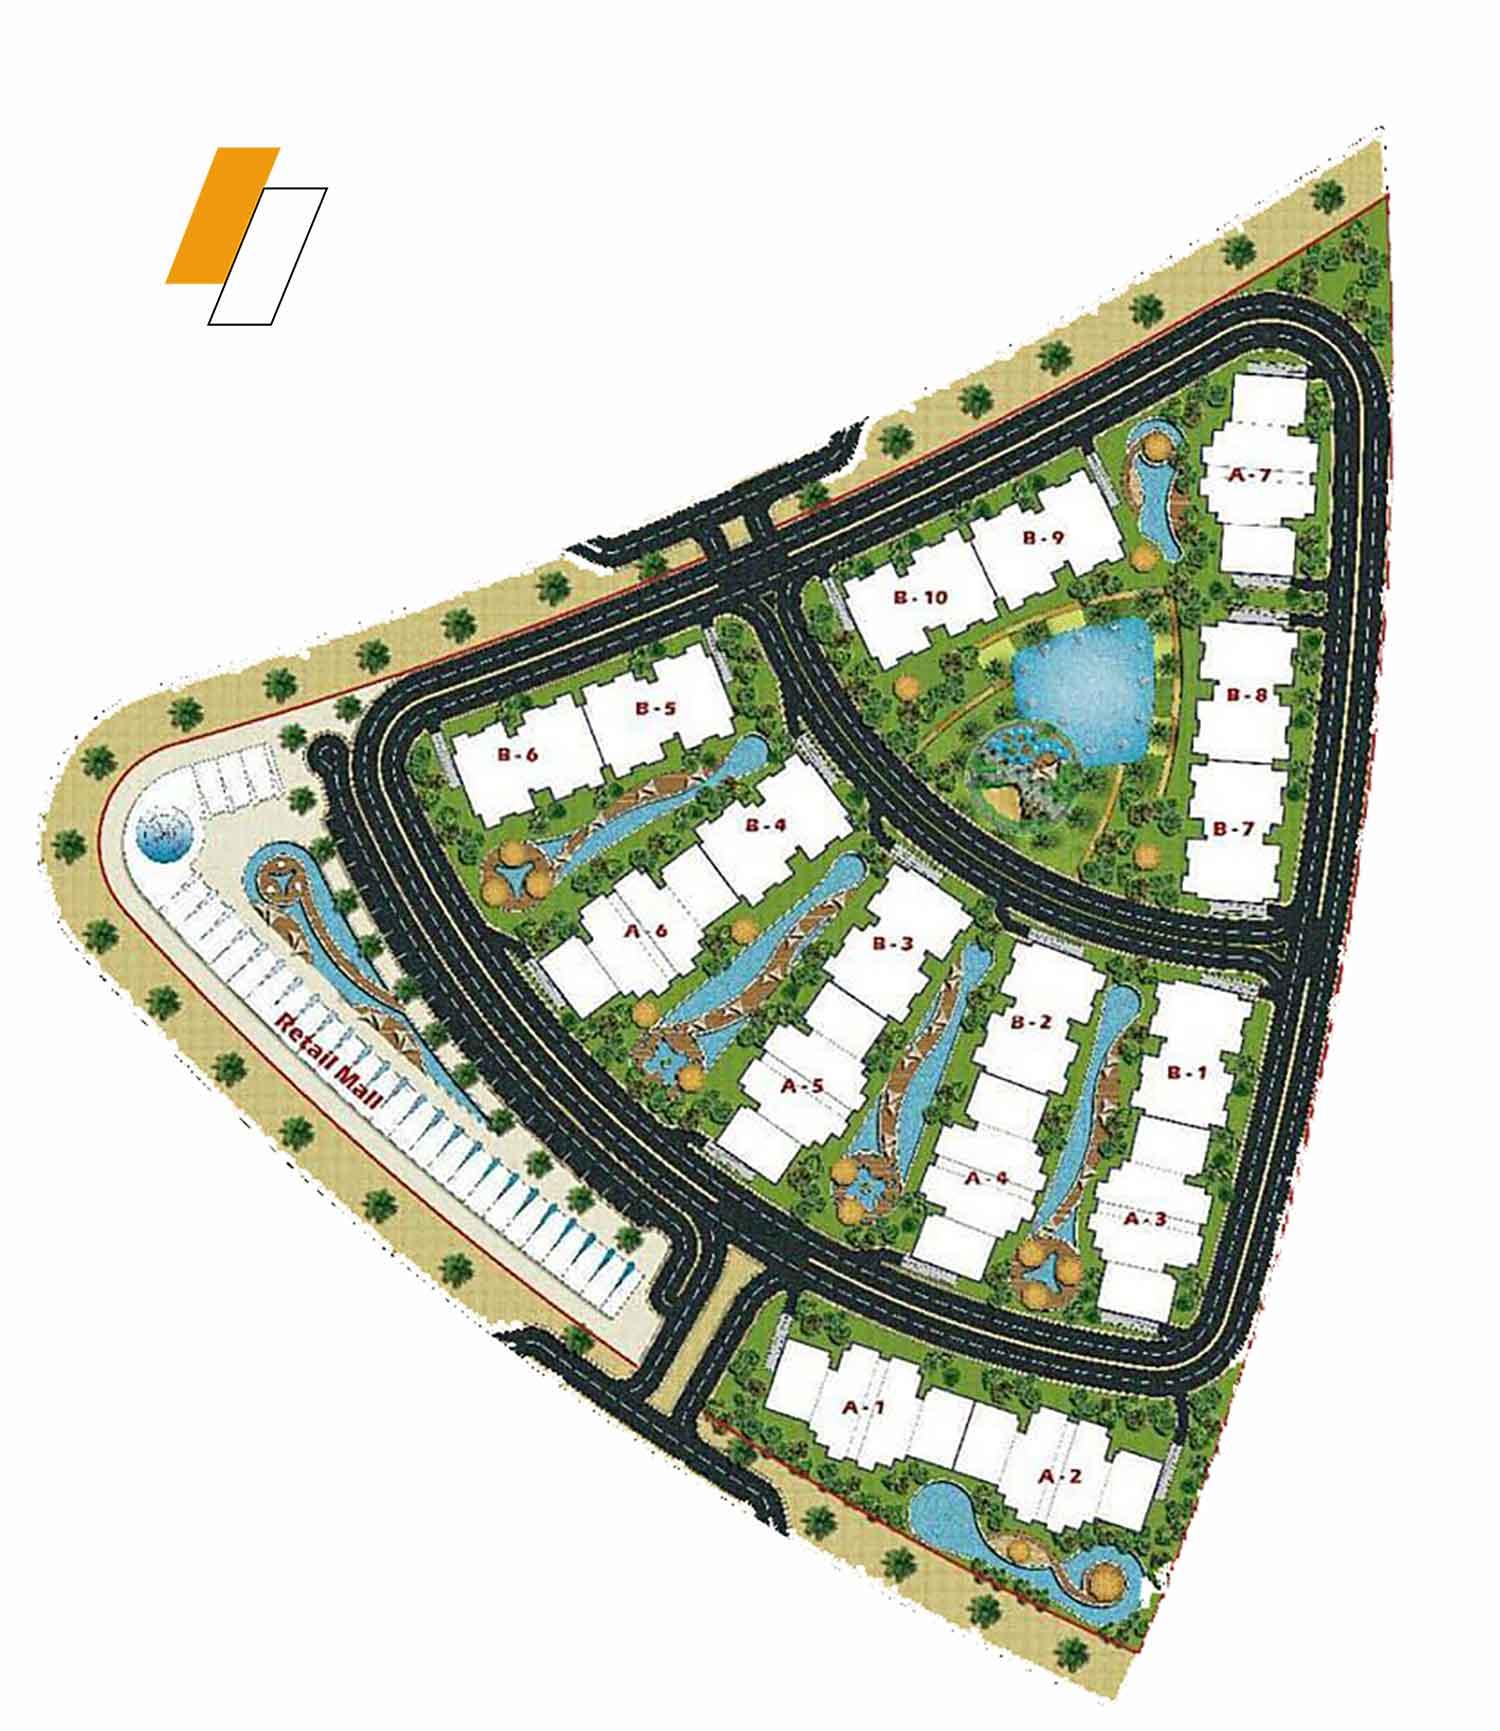 Menorca - Master plan image - Flash property                                                style=